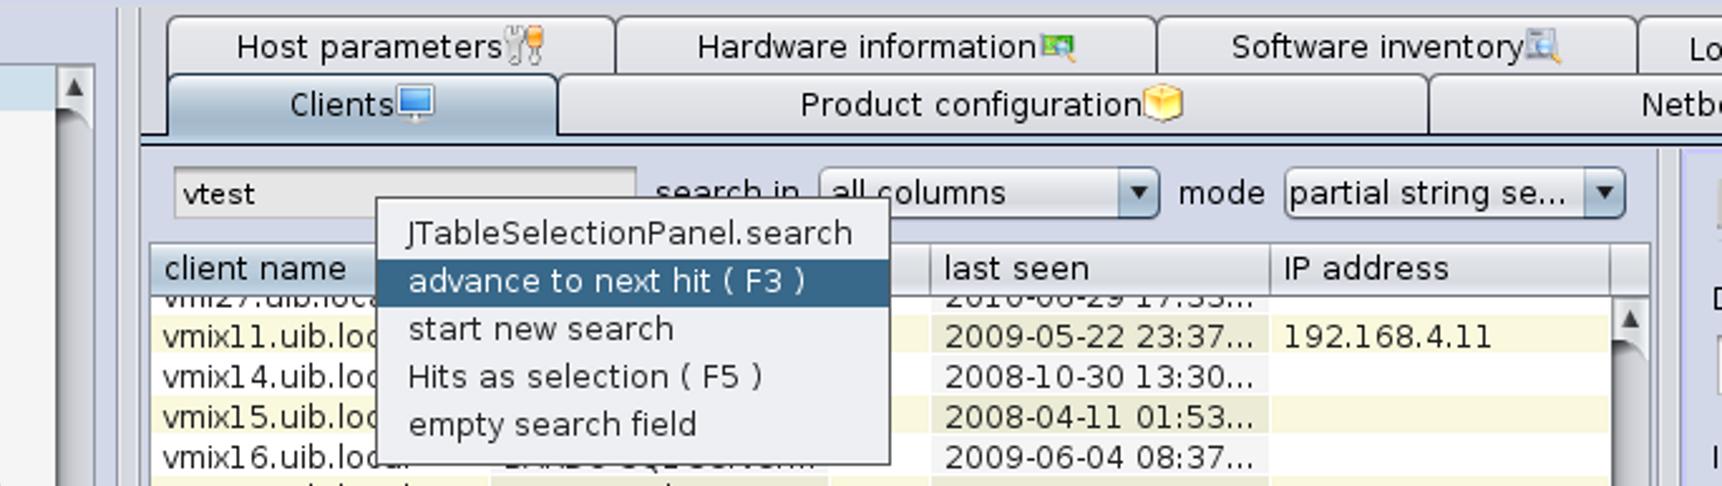 8051c7f6092 opsi manual opsi version 4.1